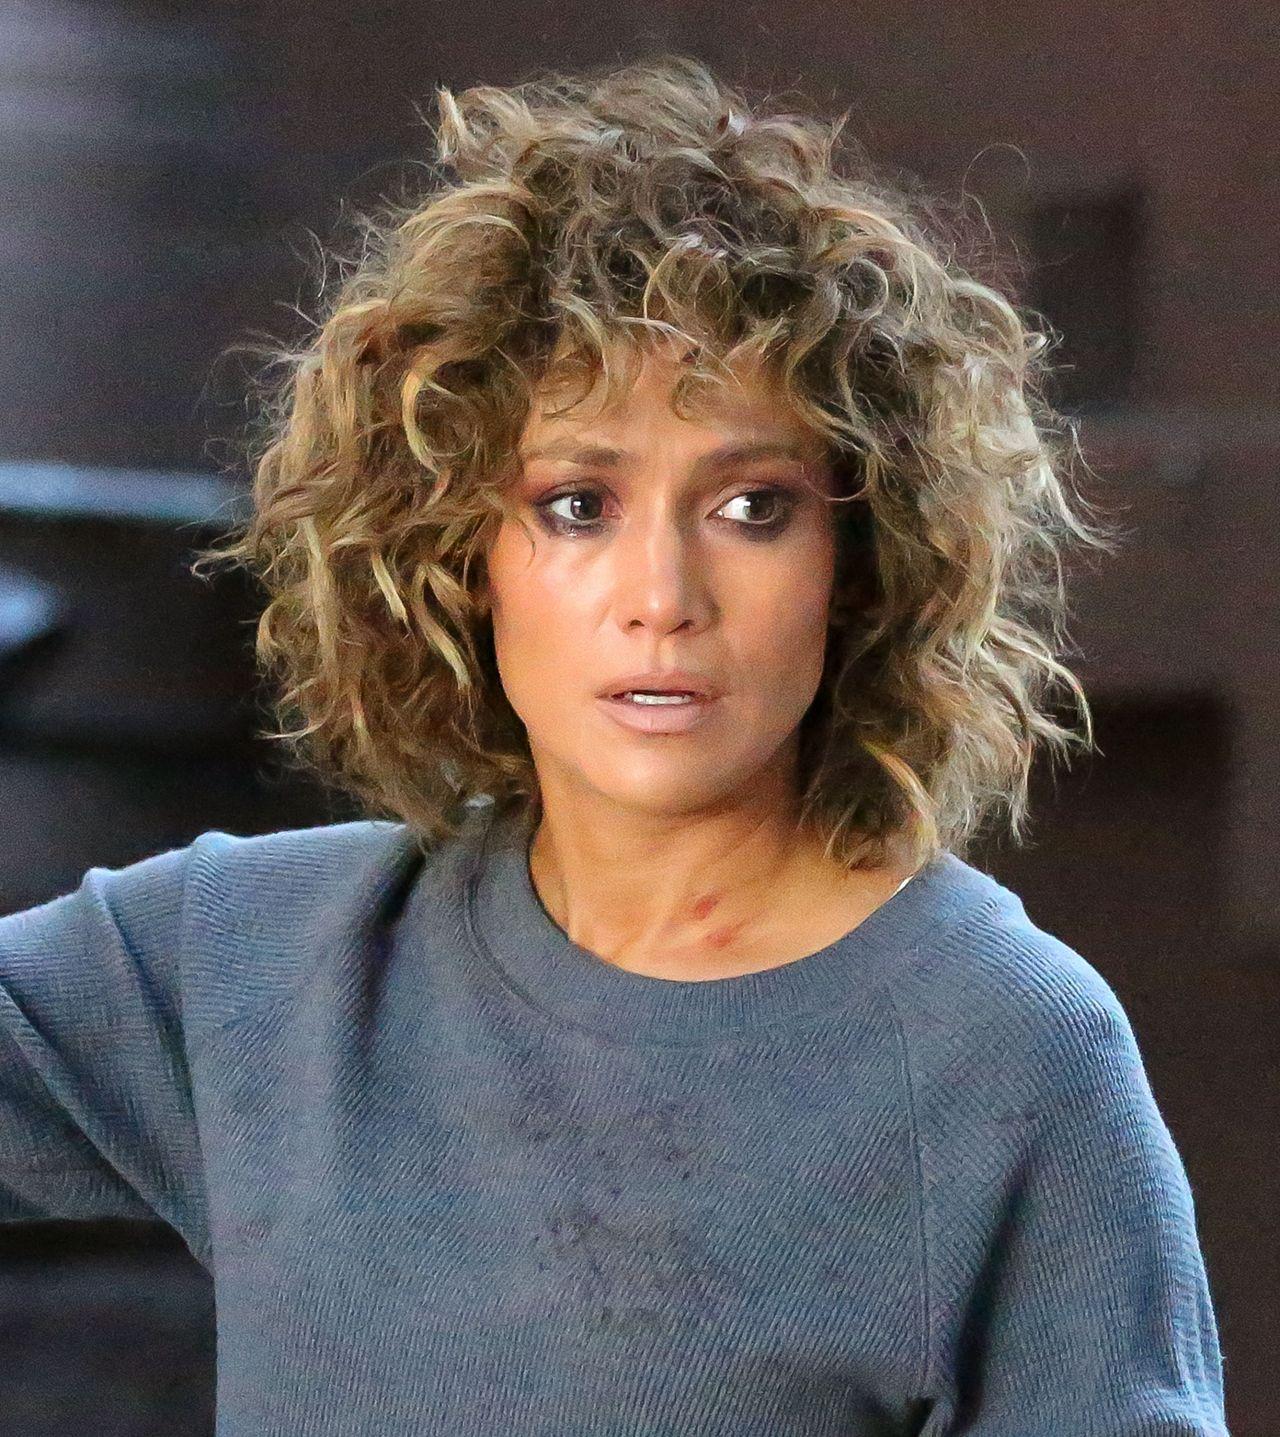 Jennifer Lopez  Sheds Tears on Set of Shades of Blue in